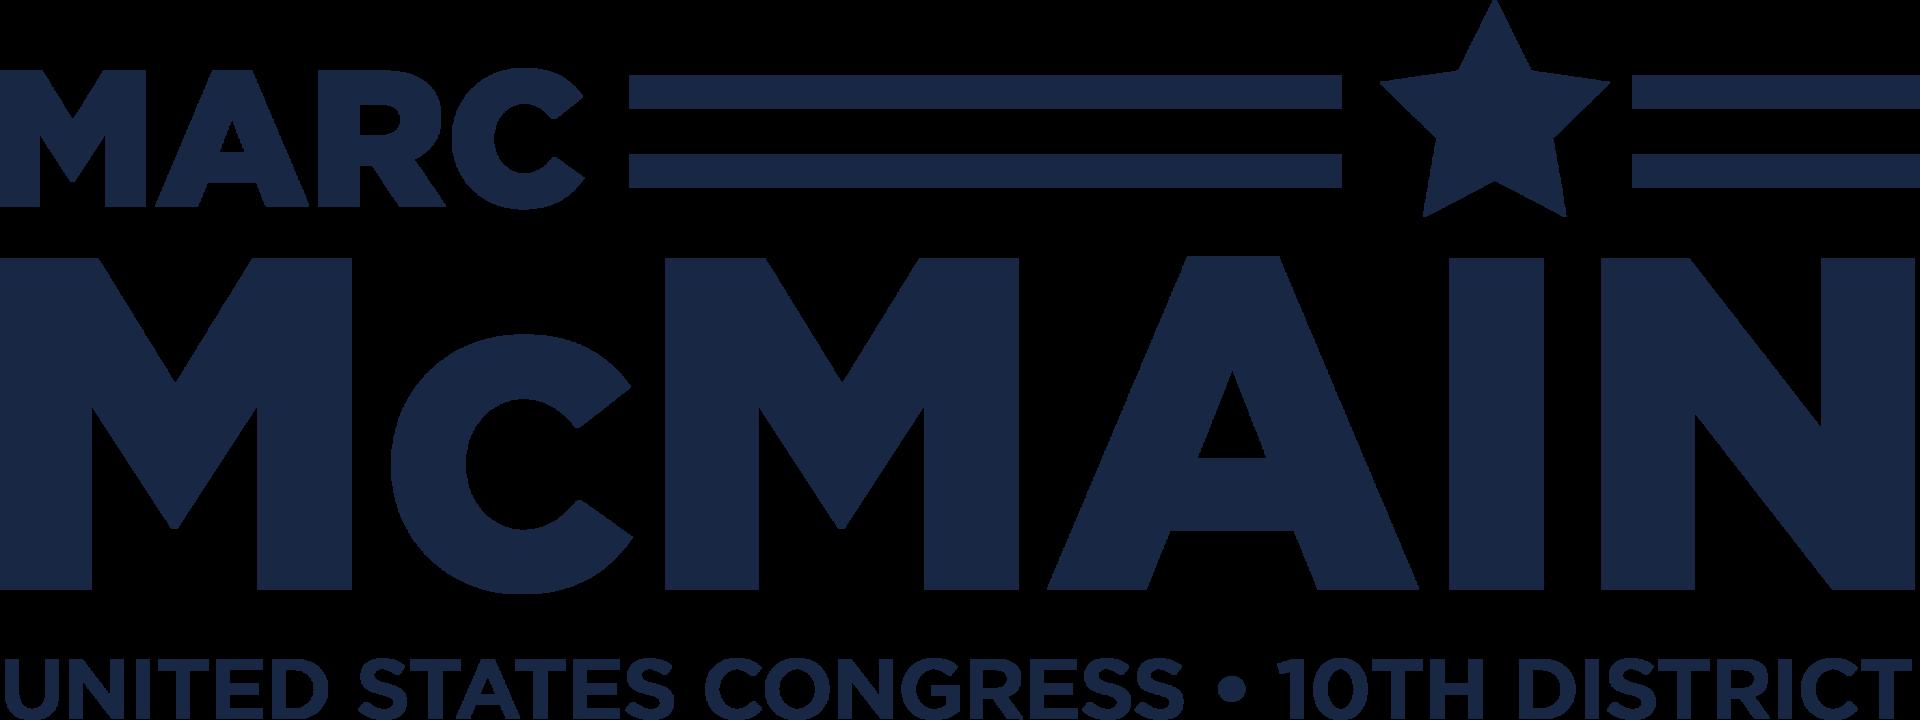 Marc logo blue